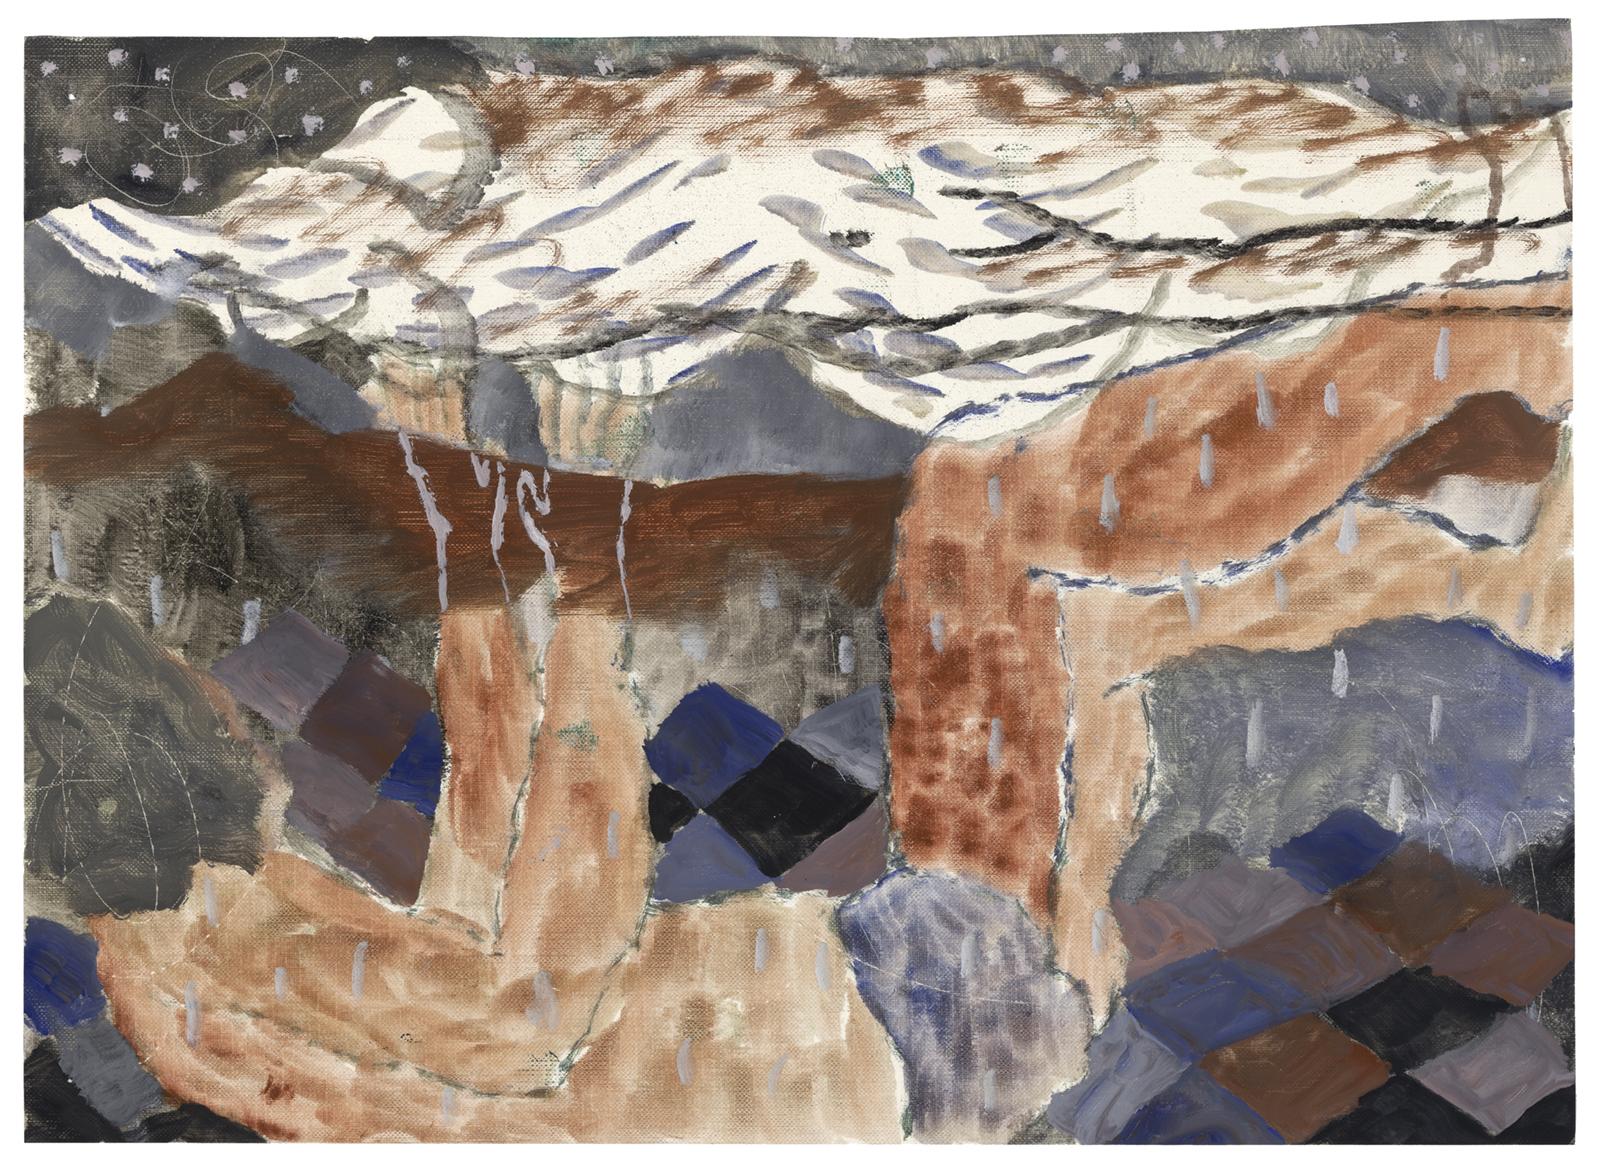 Three A.M., 2017, oil on paper, 11.5 x 16 in